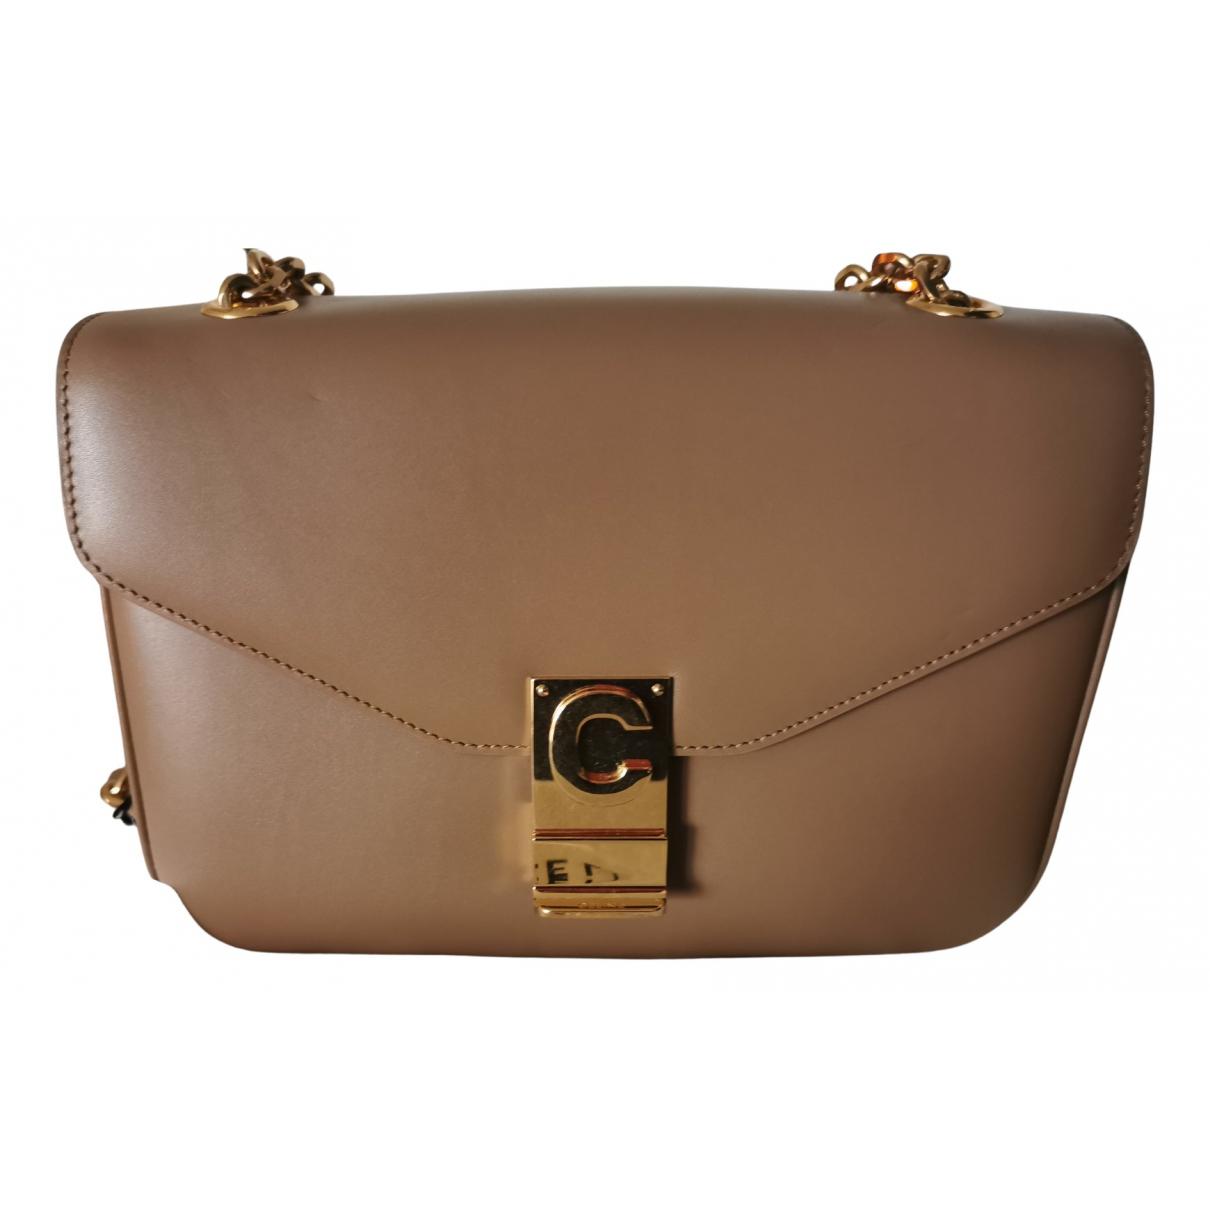 Celine C bag Beige Leather handbag for Women N